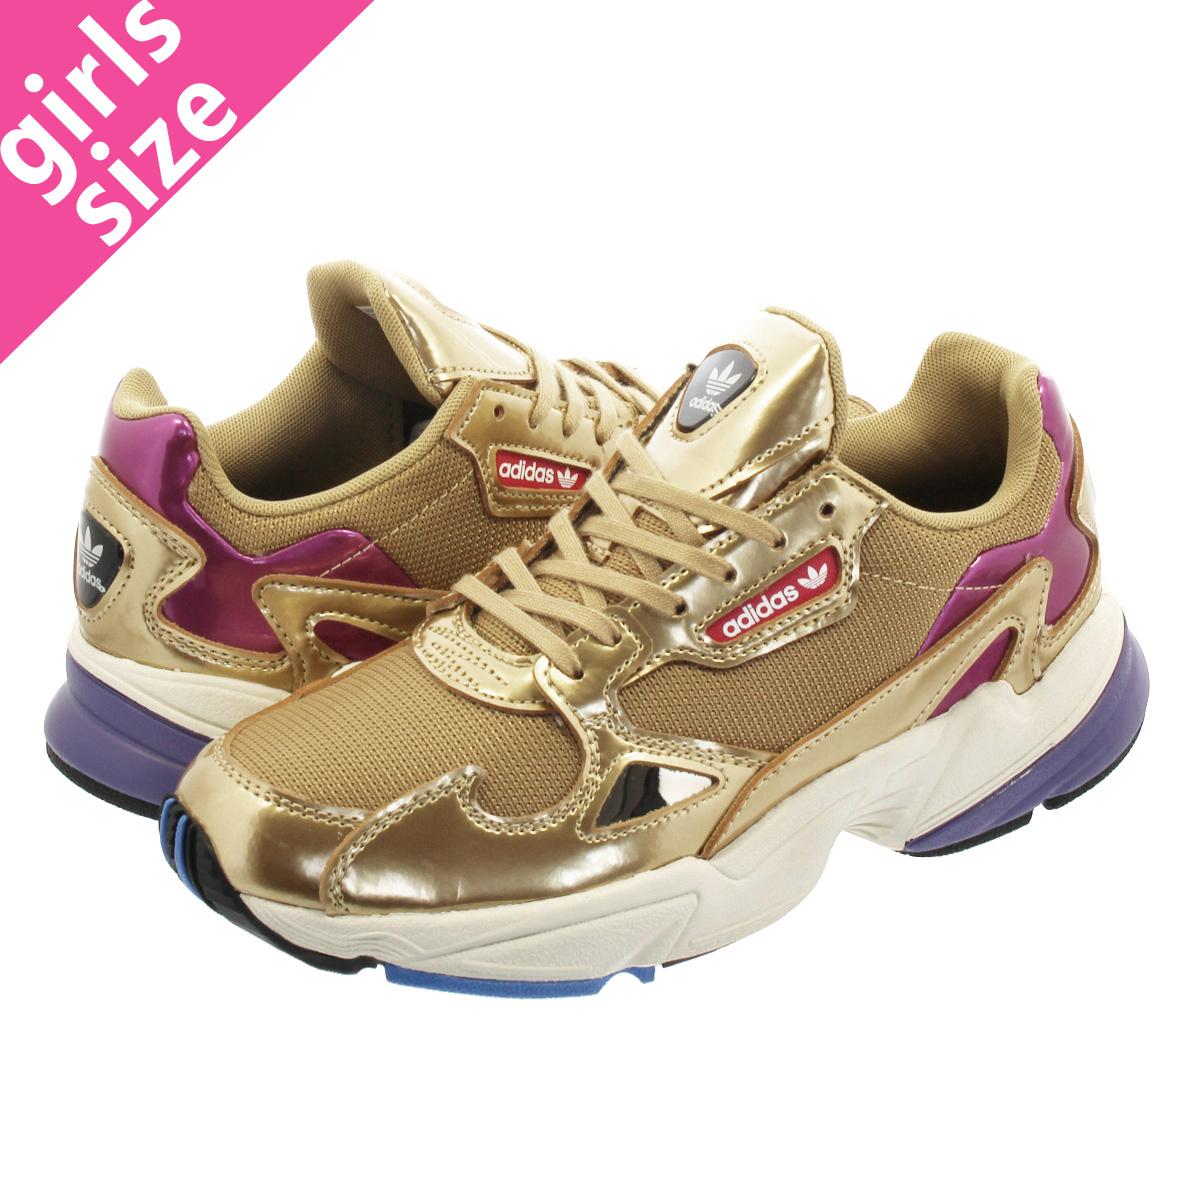 huge discount 34c0f 01a6e adidas ADIDASFALCON W Adidas Adidas falcon women GOLD METGOLD METOFF  WHITE cg6247